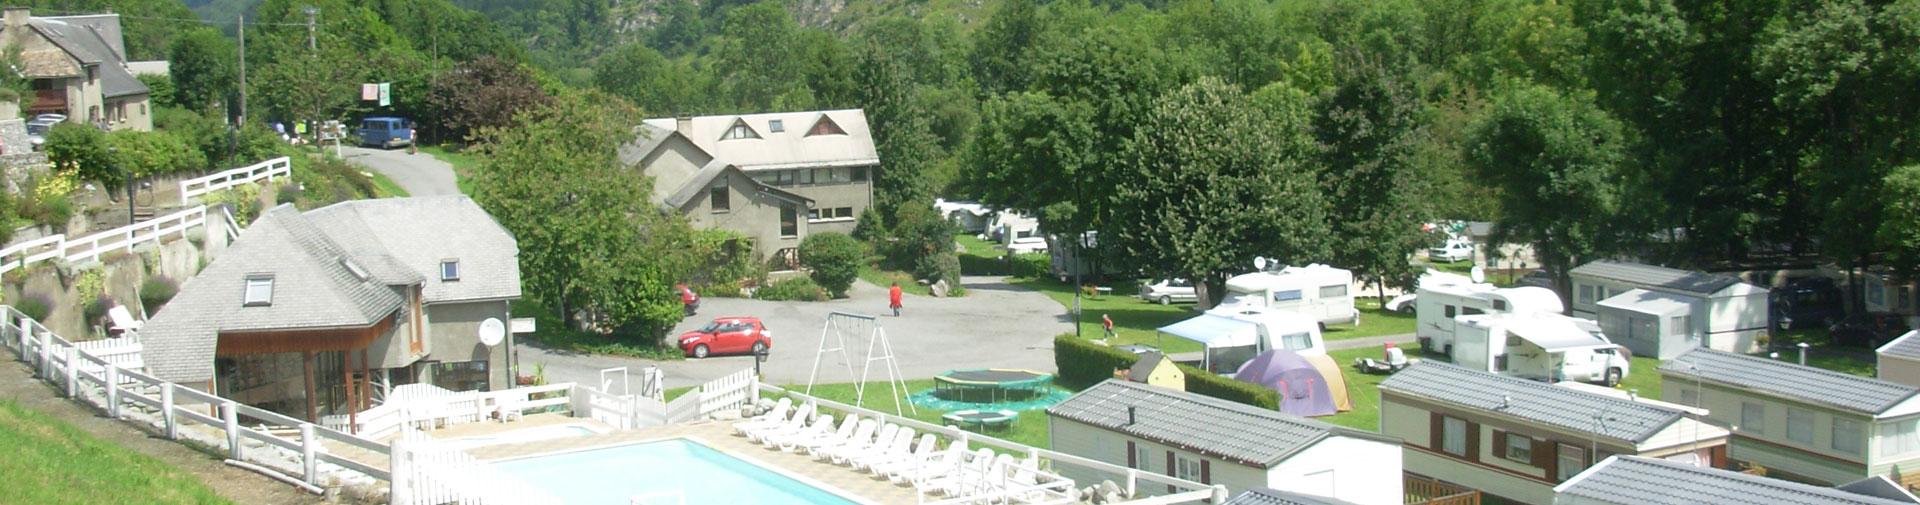 services camping oree des monts hautes pyrenees